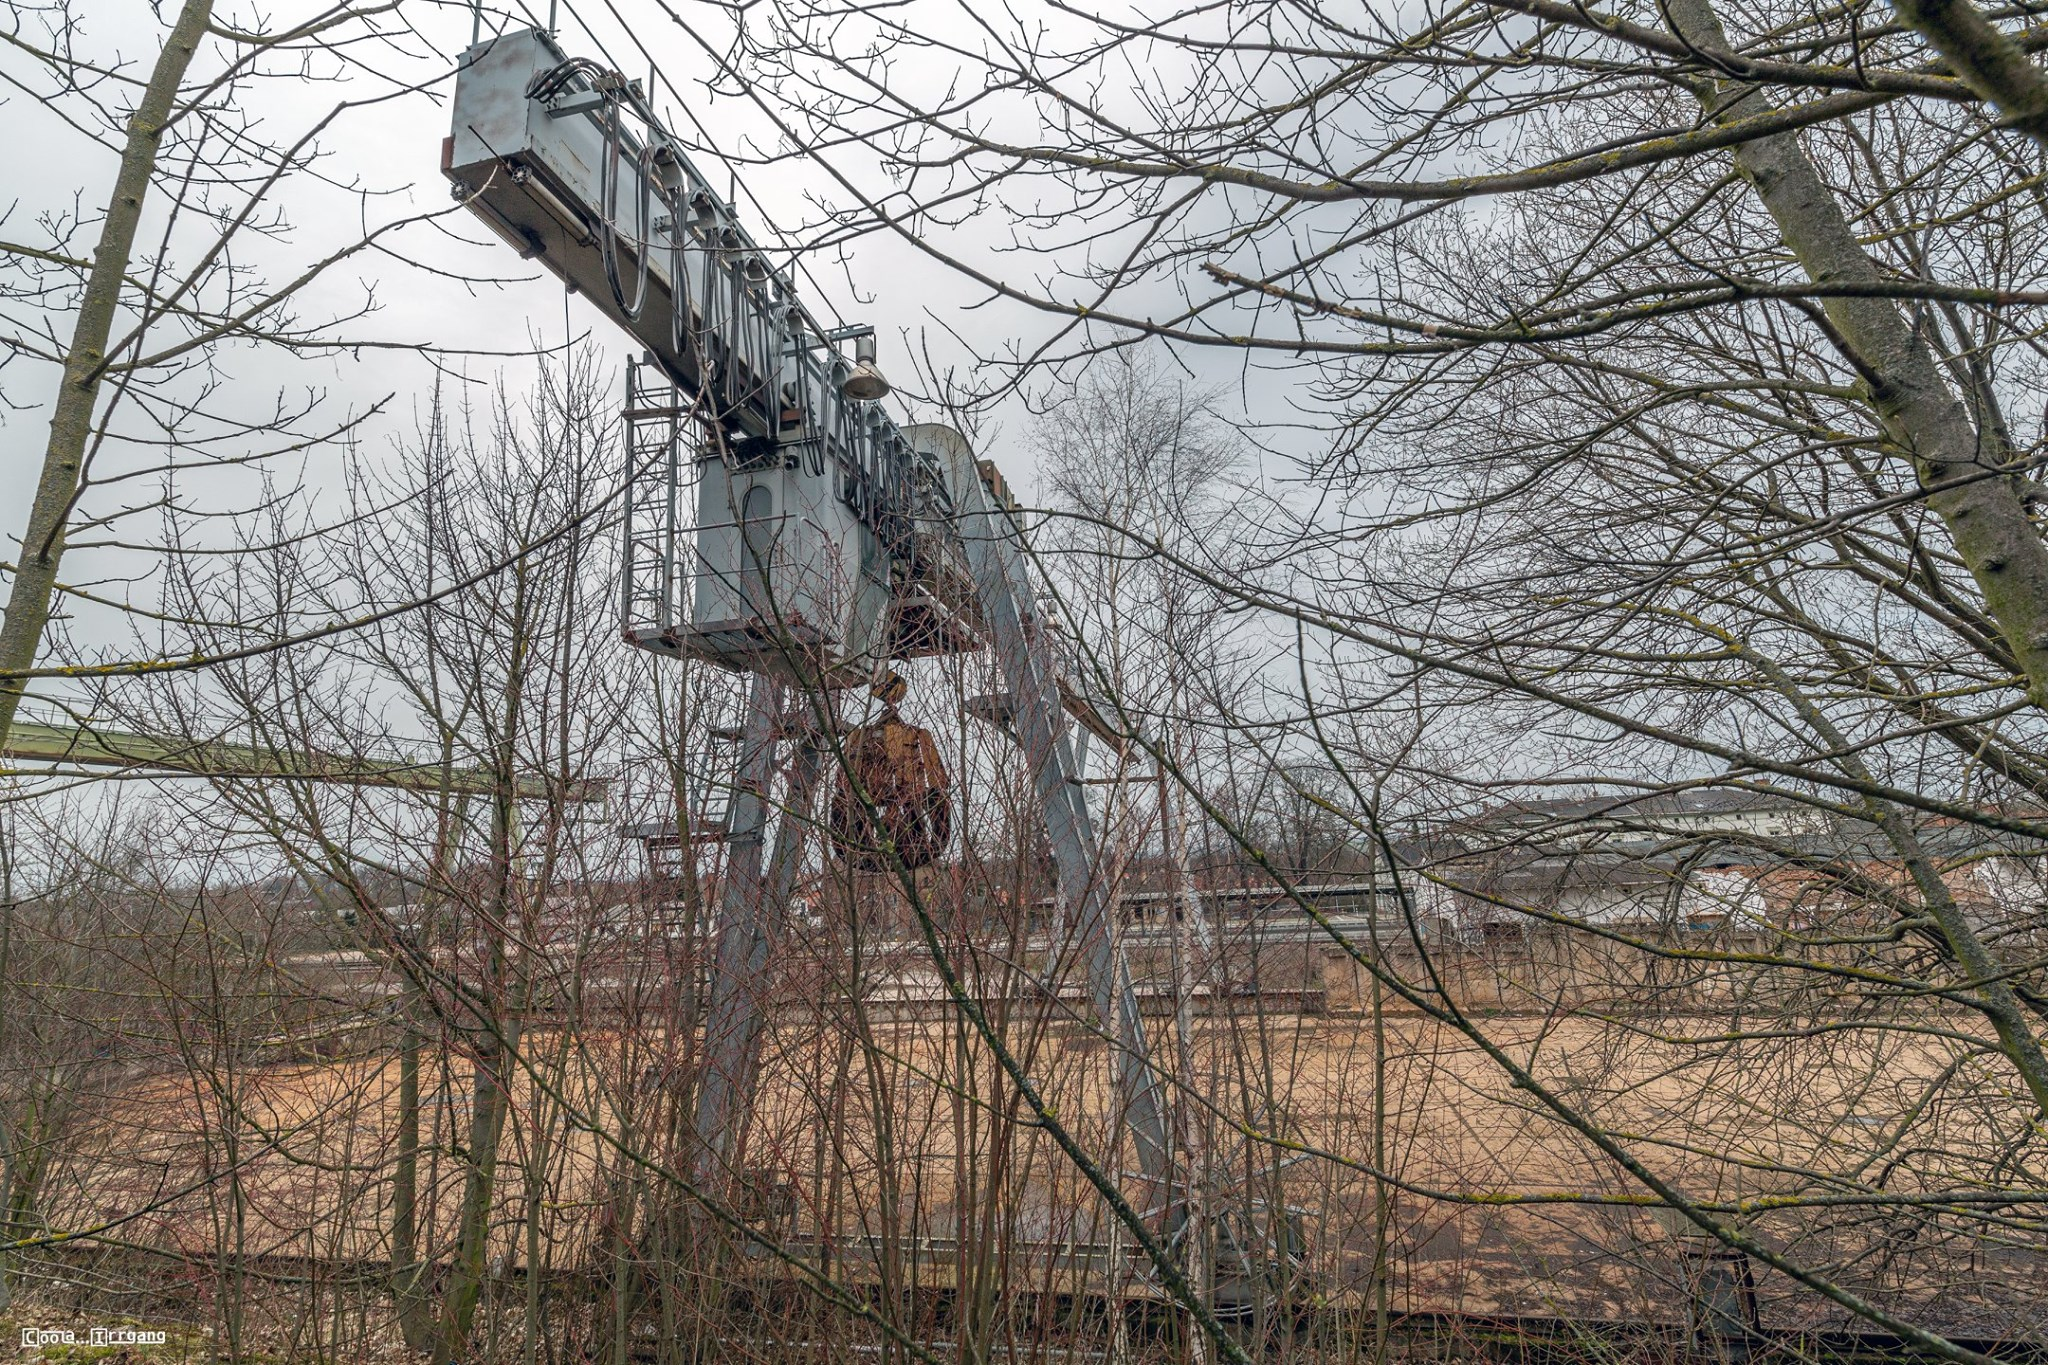 Güterabfertigung-Bad-langensalza9